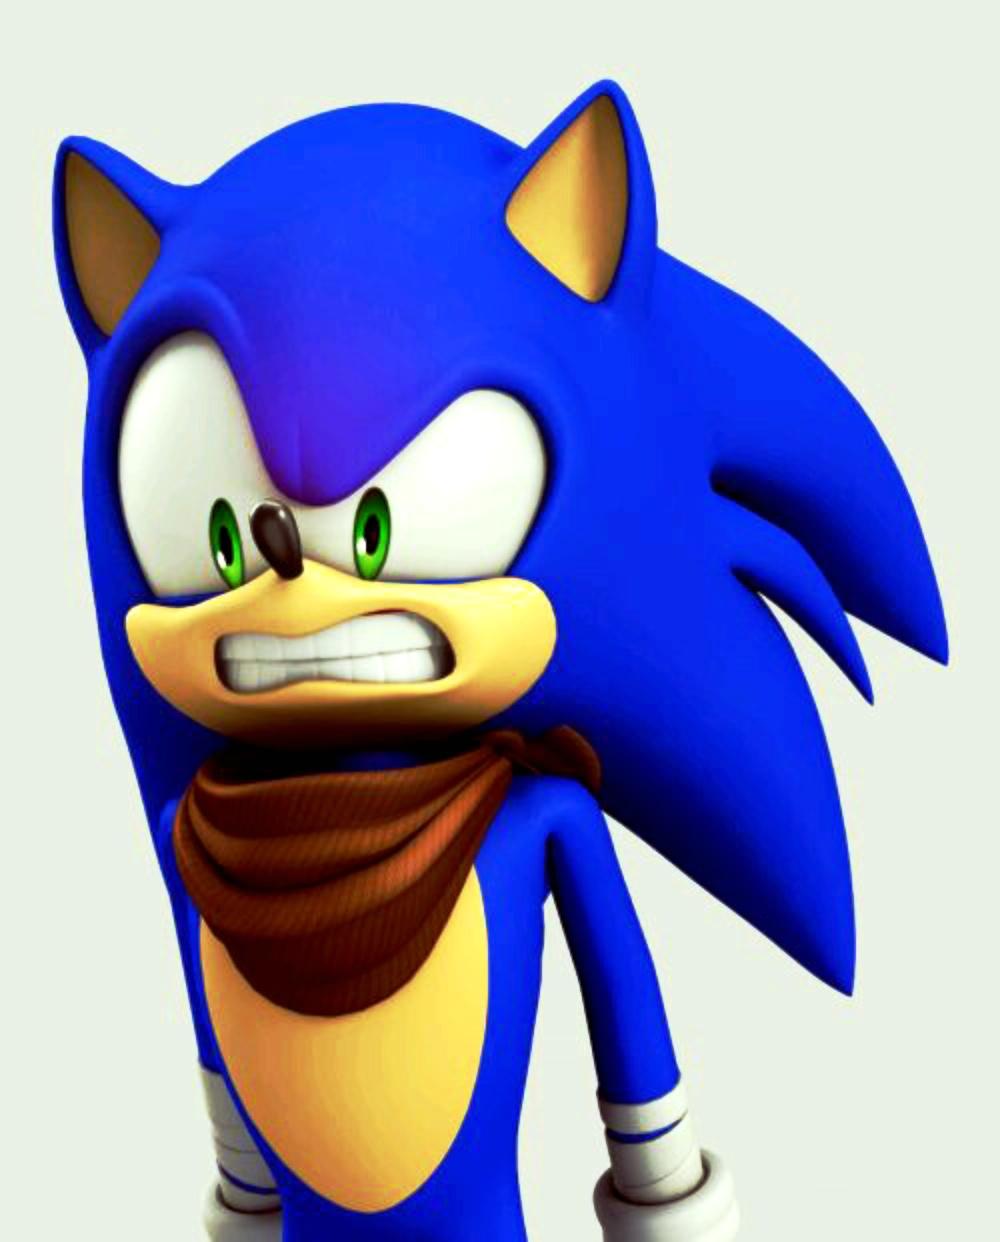 SONIC BOOM - Sonic the hedgehog by Nadiafreedom on DeviantArt